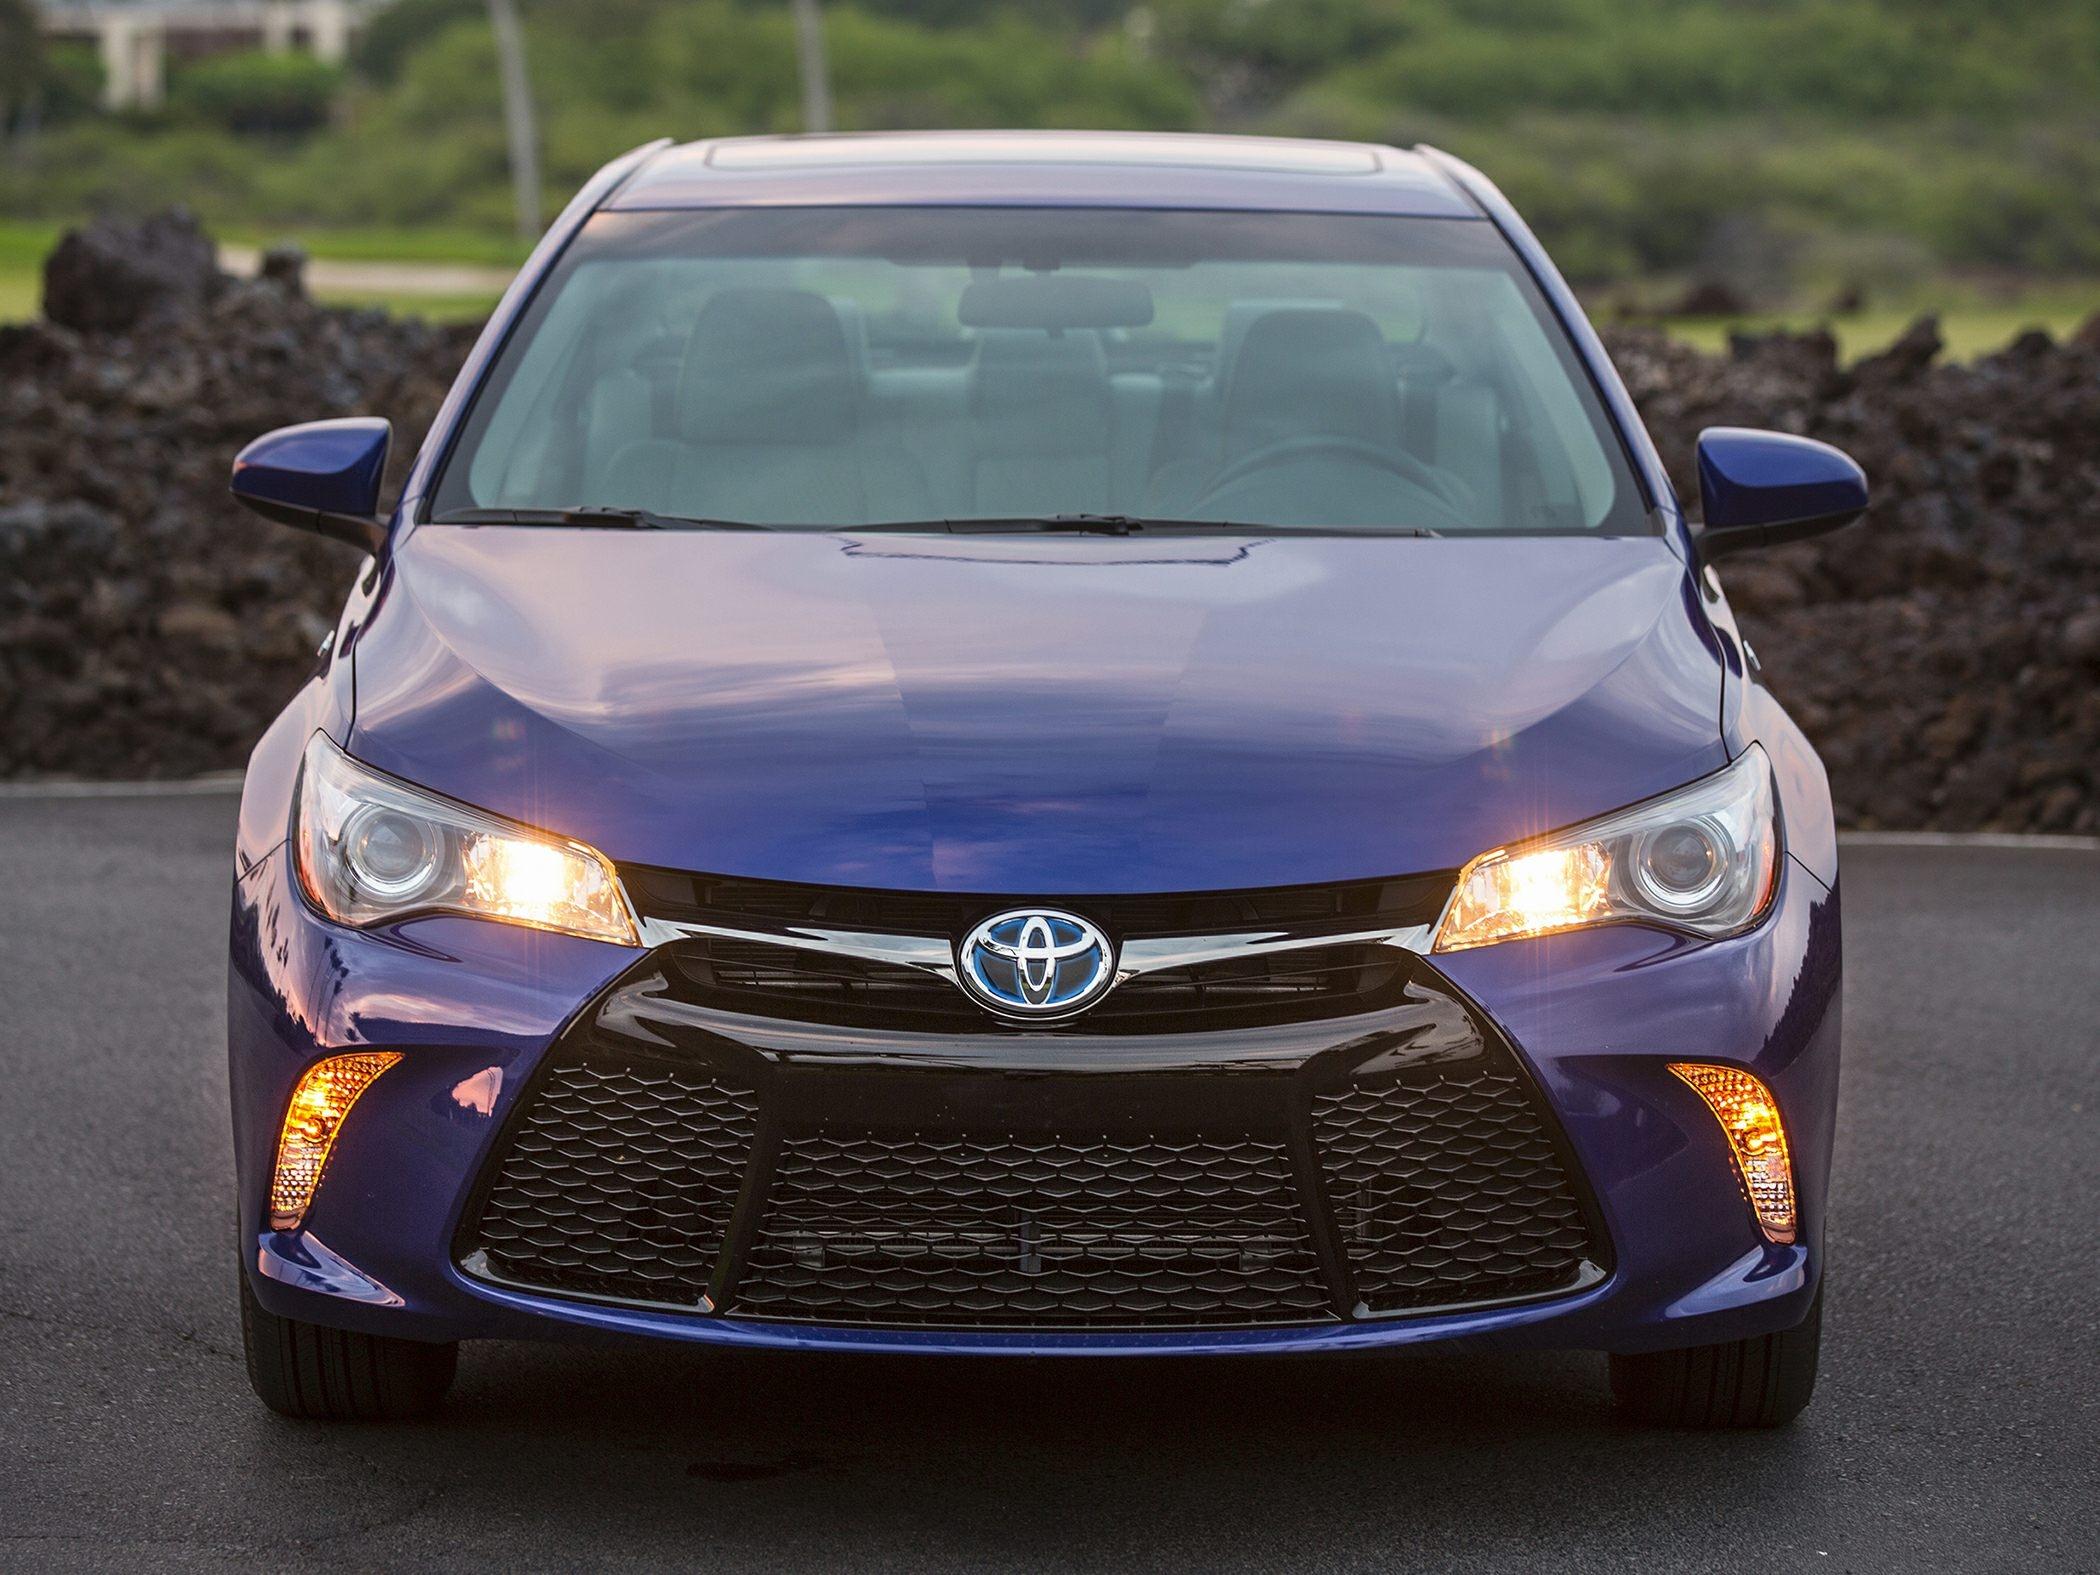 new 2016 toyota camry hybrid price photos reviews safety 2015 toyota camry invoice price